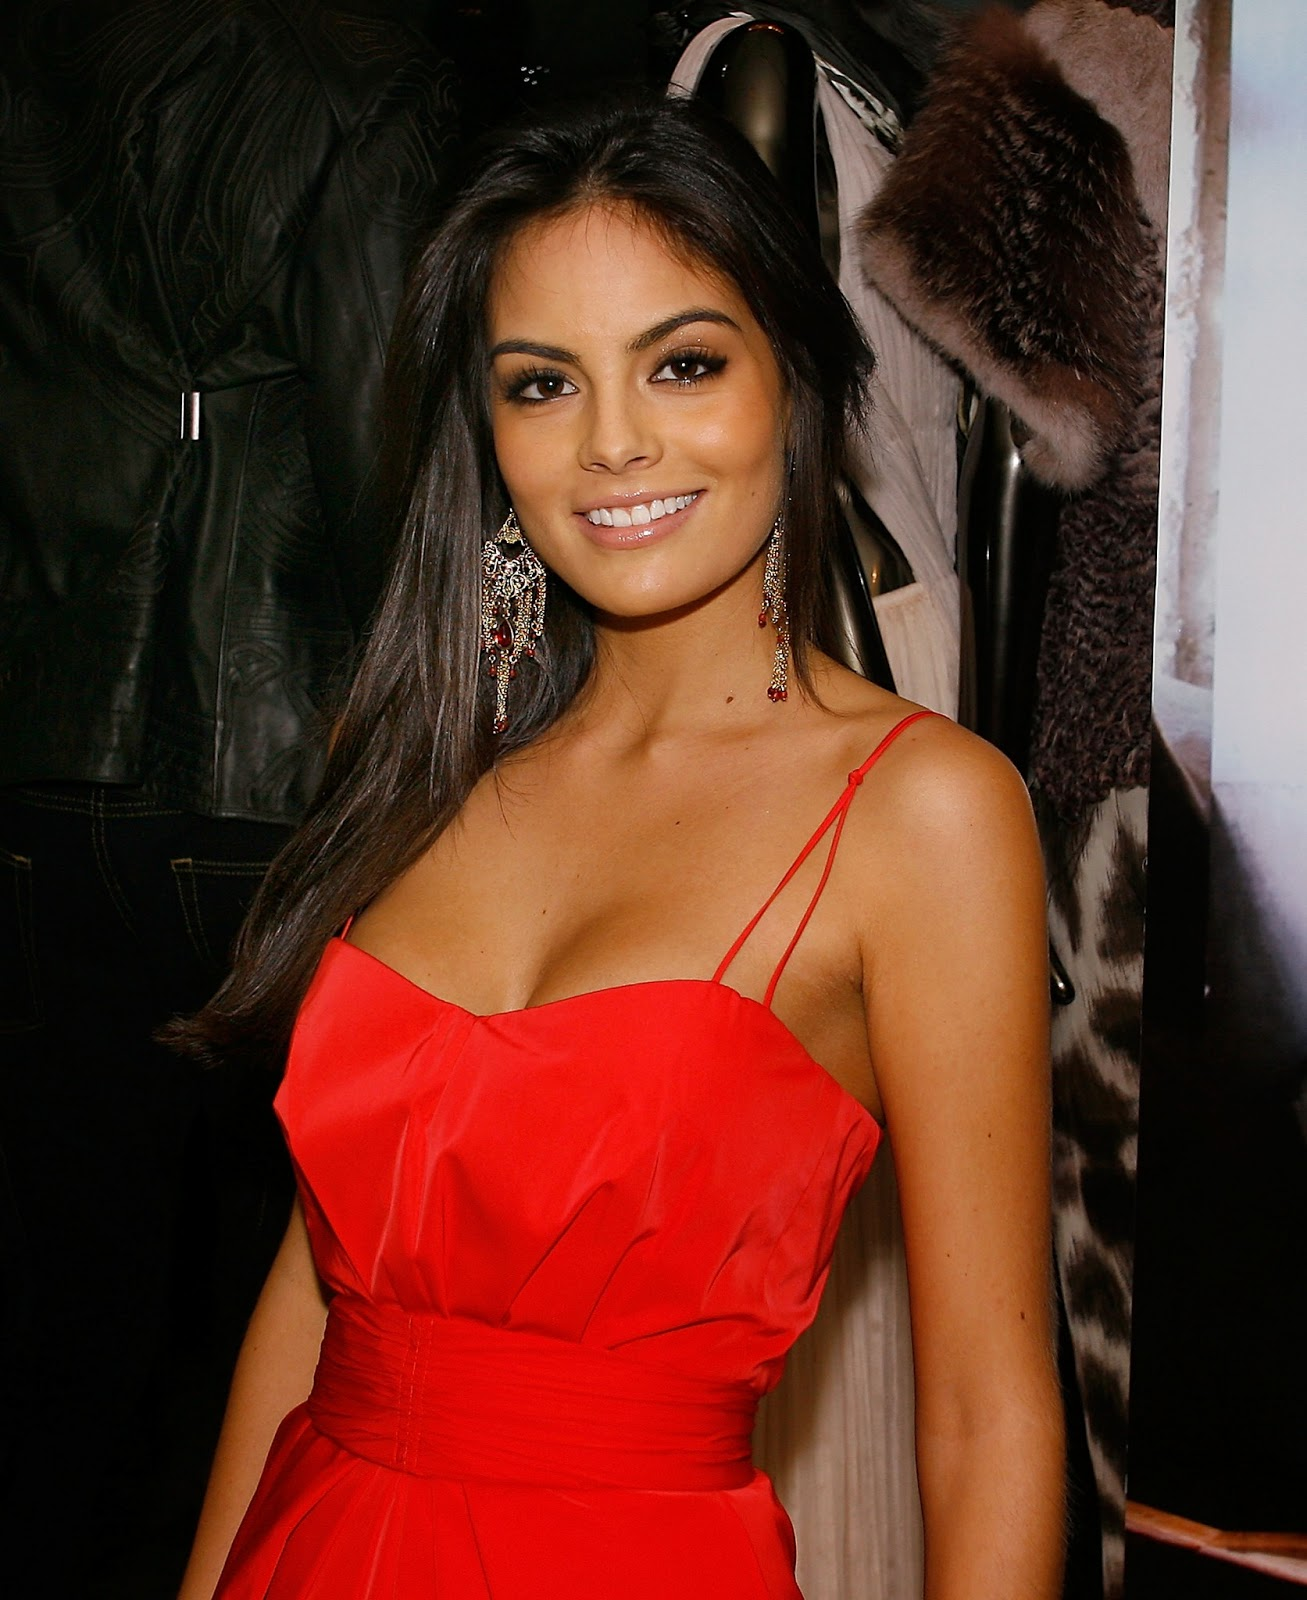 Ximena Navarrete | Hot Beautiful Sexy Mexicana